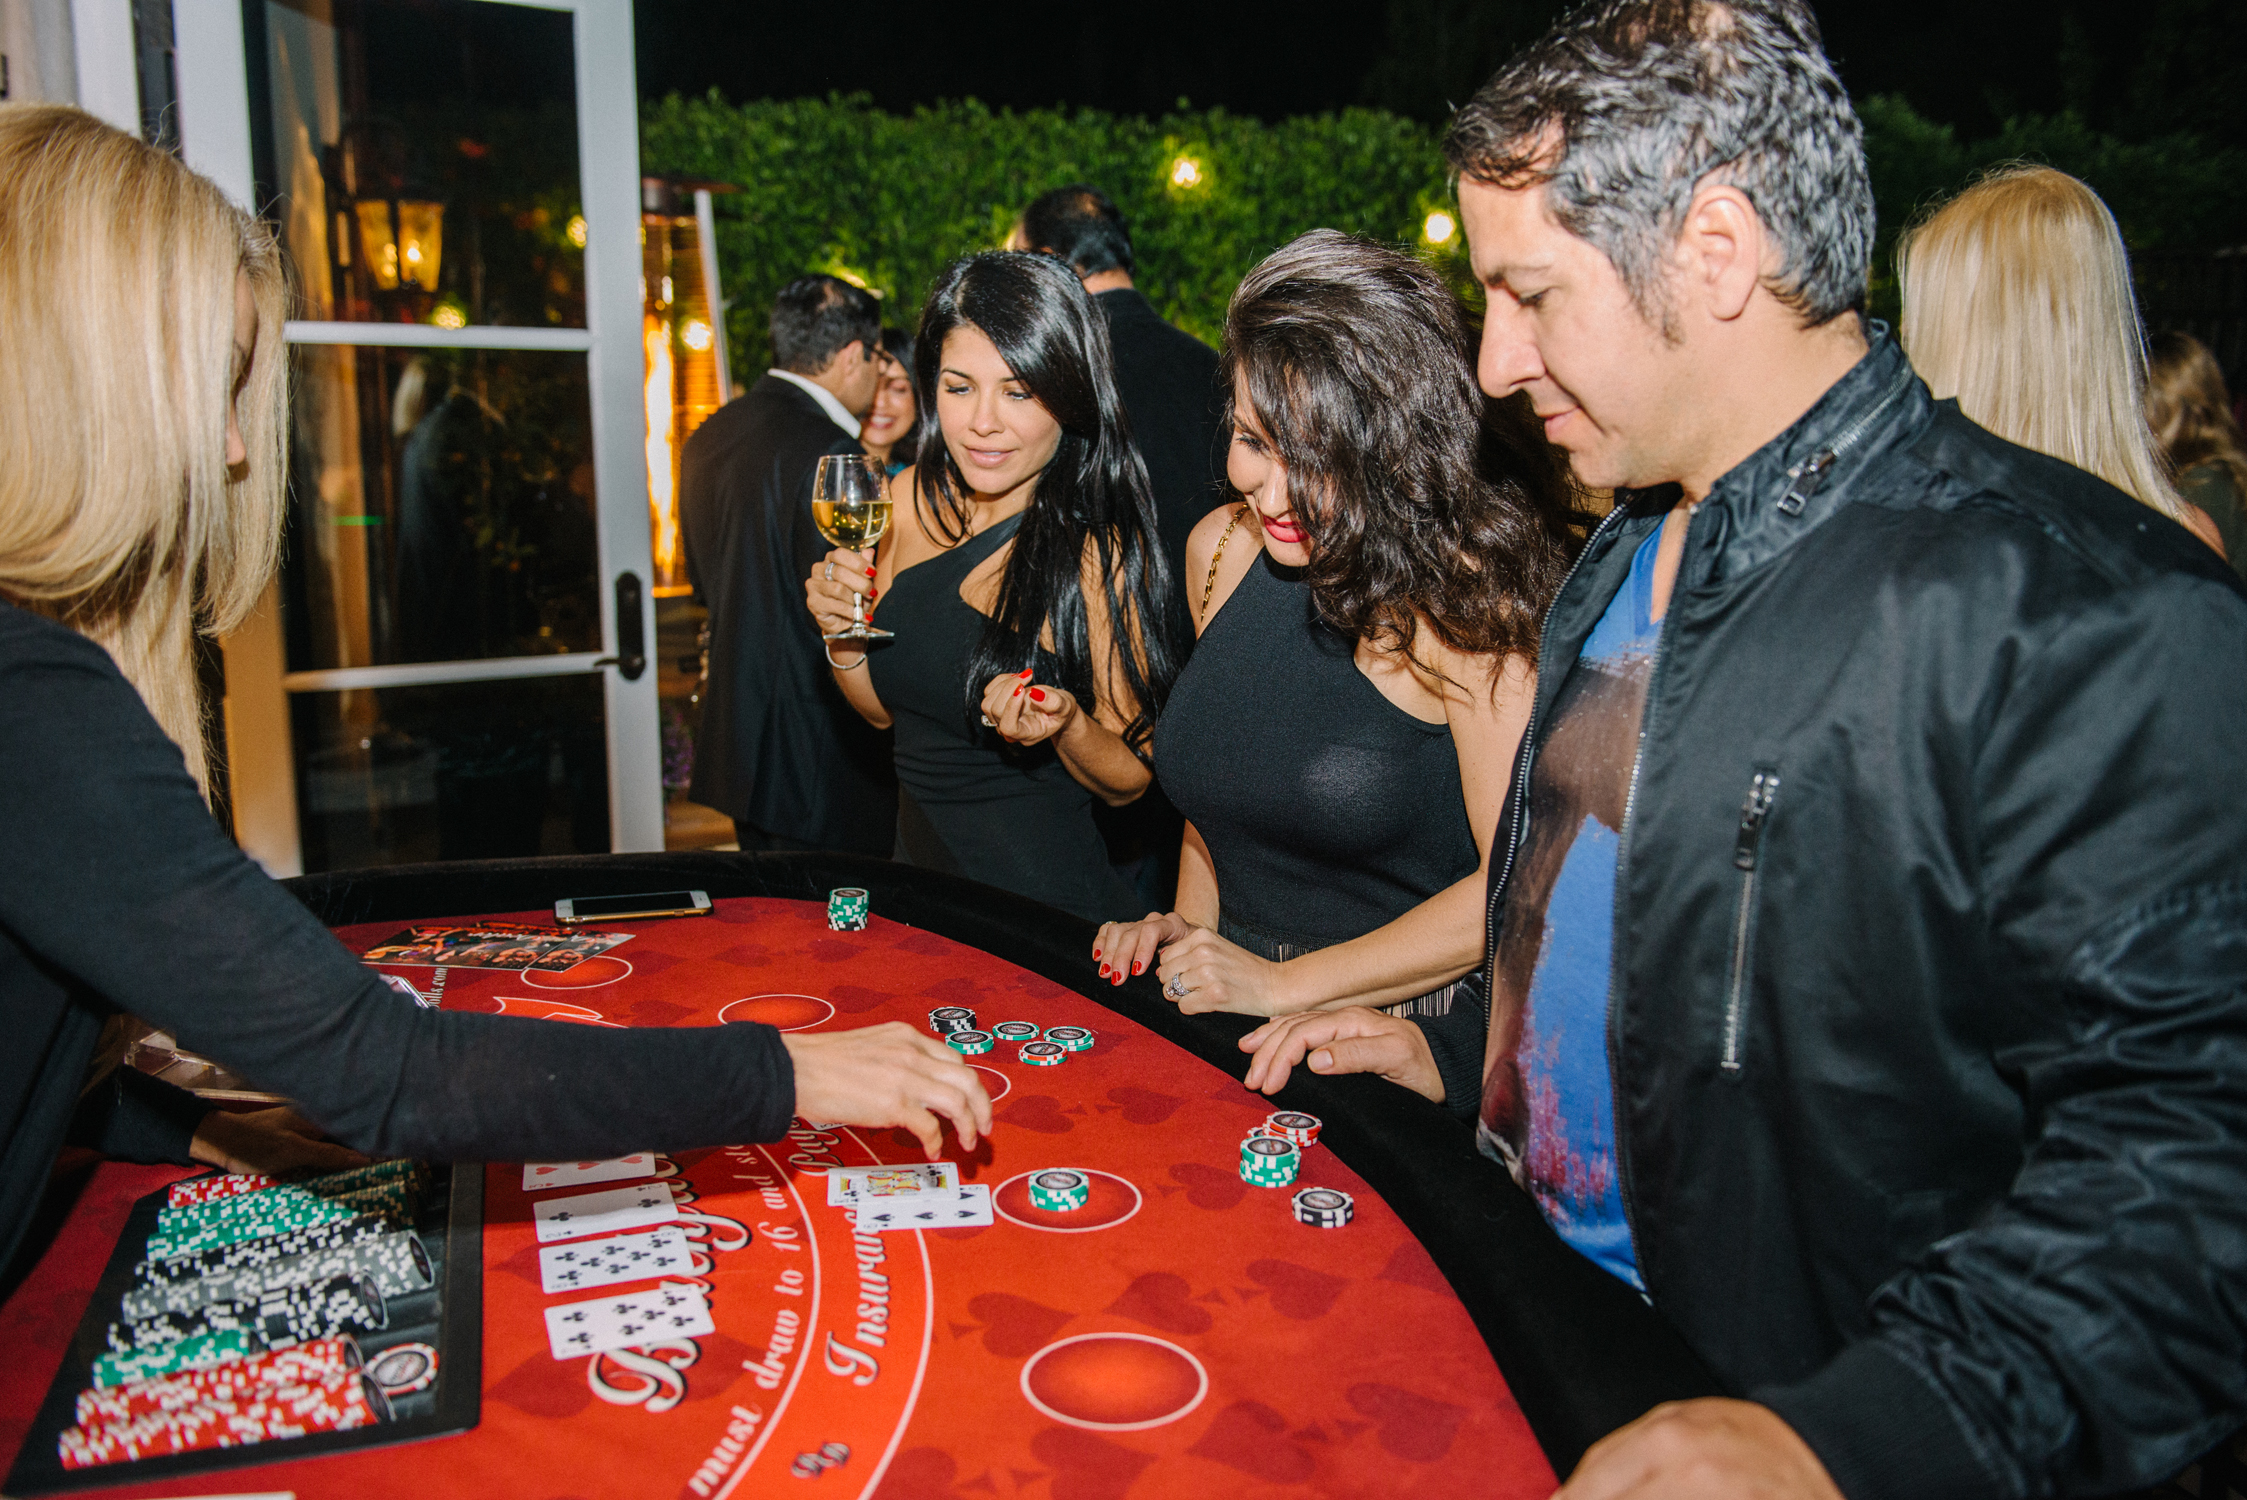 tarynco-events-vegas-casino-party.jpg